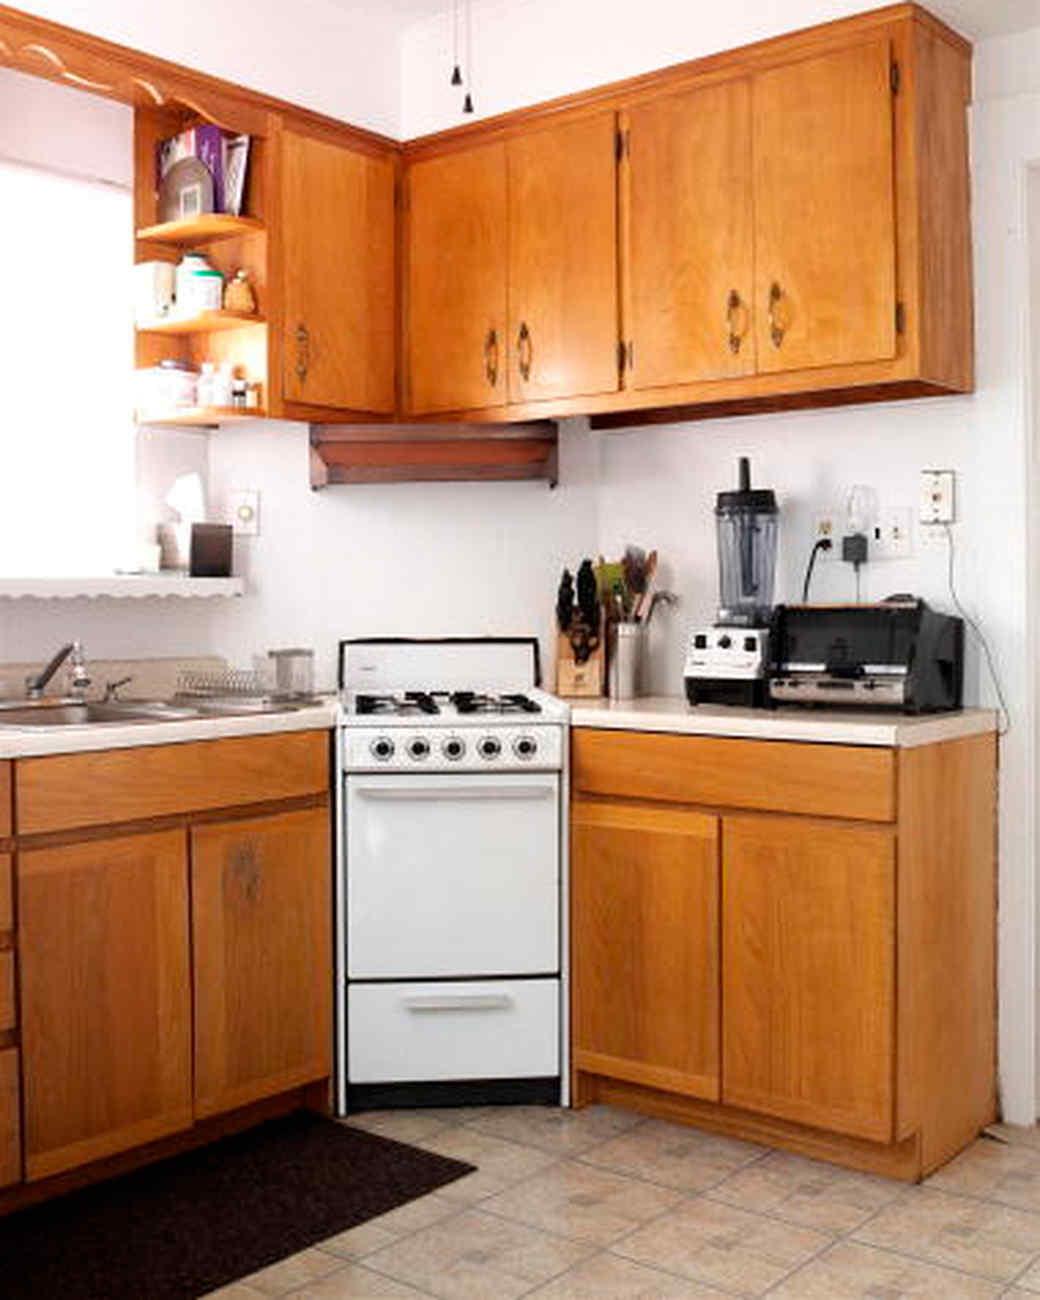 13 Brilliant Kitchen Lighting Ideas: 6 Bright Kitchen Lighting Ideas: See How New Fixtures